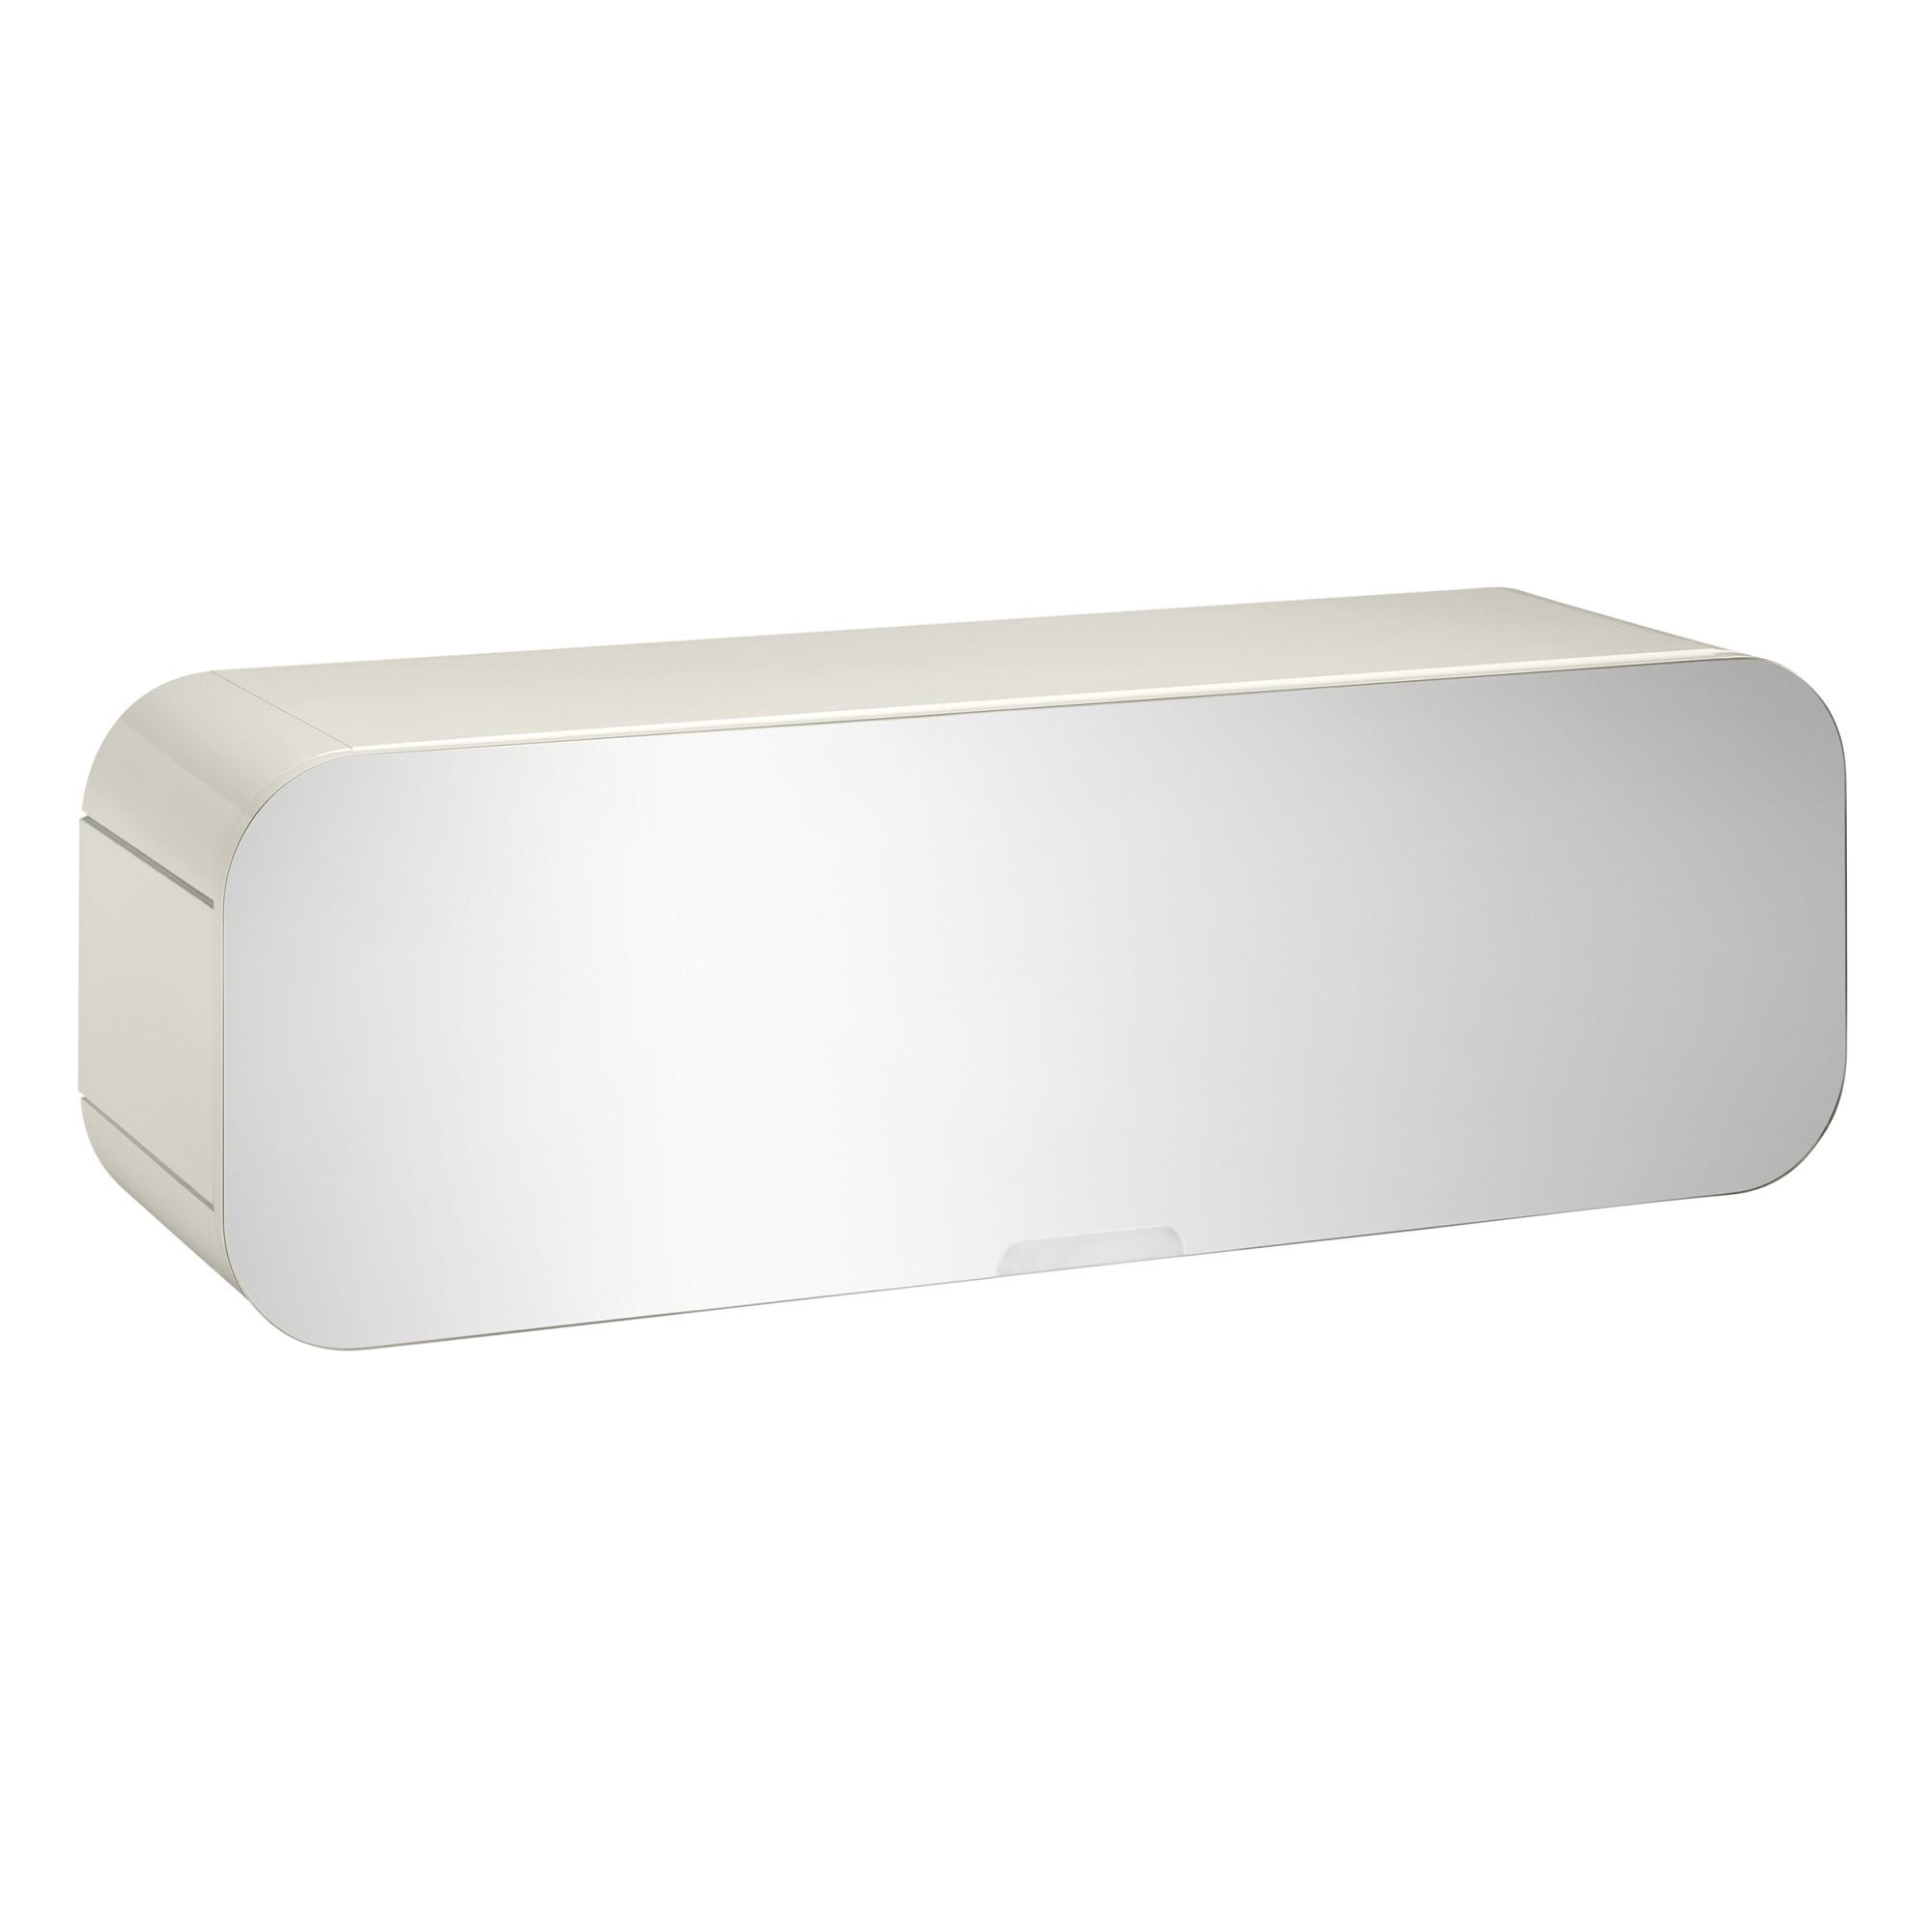 Tiger Ontario horizontale spiegelkast 105 cm, wit hoogglans